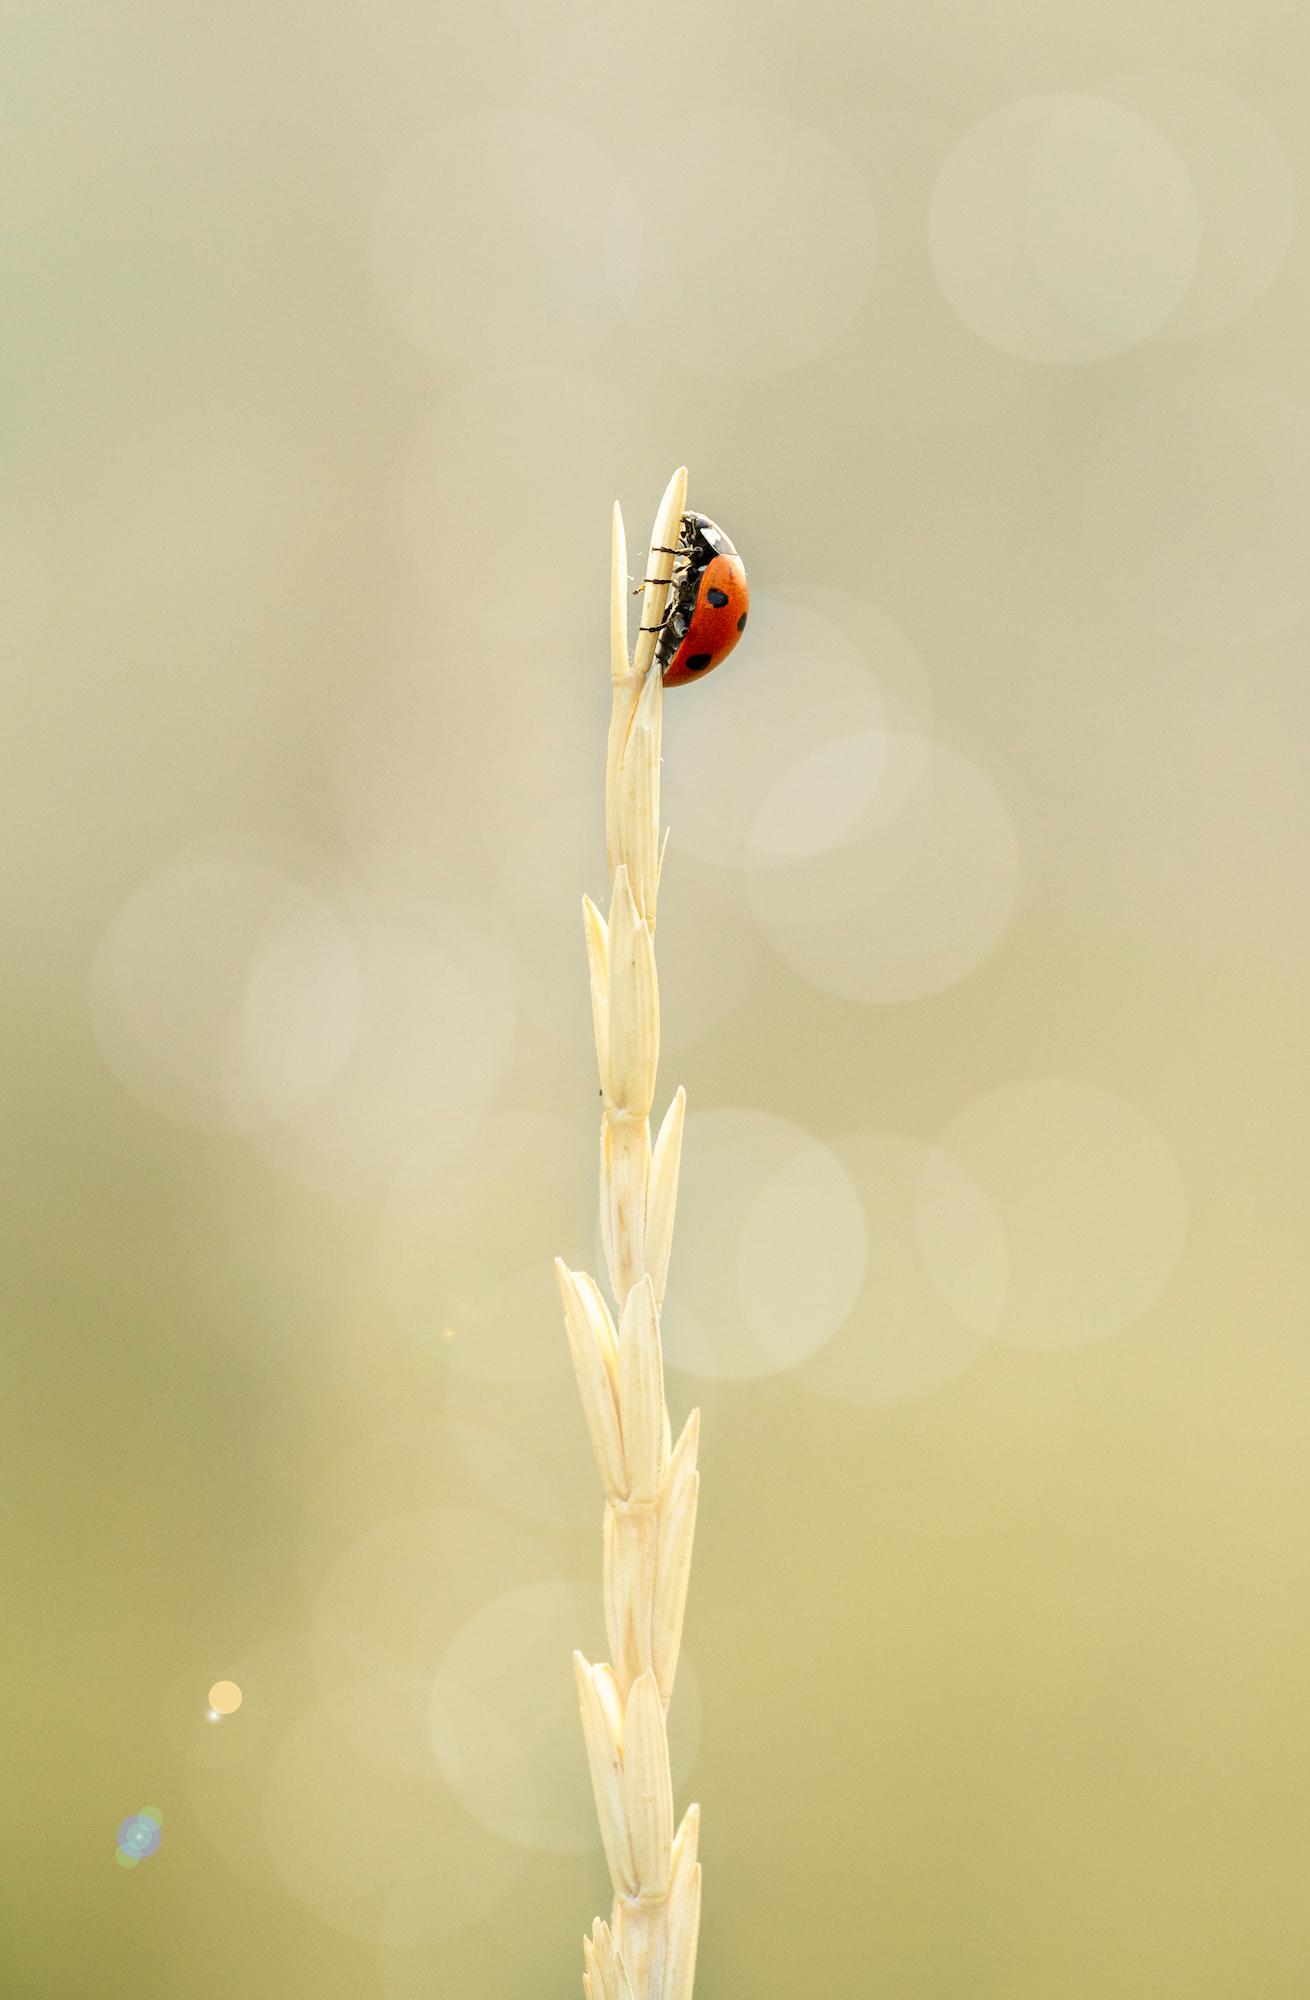 Ladybug Coccinella septempunctata resting on a dry blade of grass